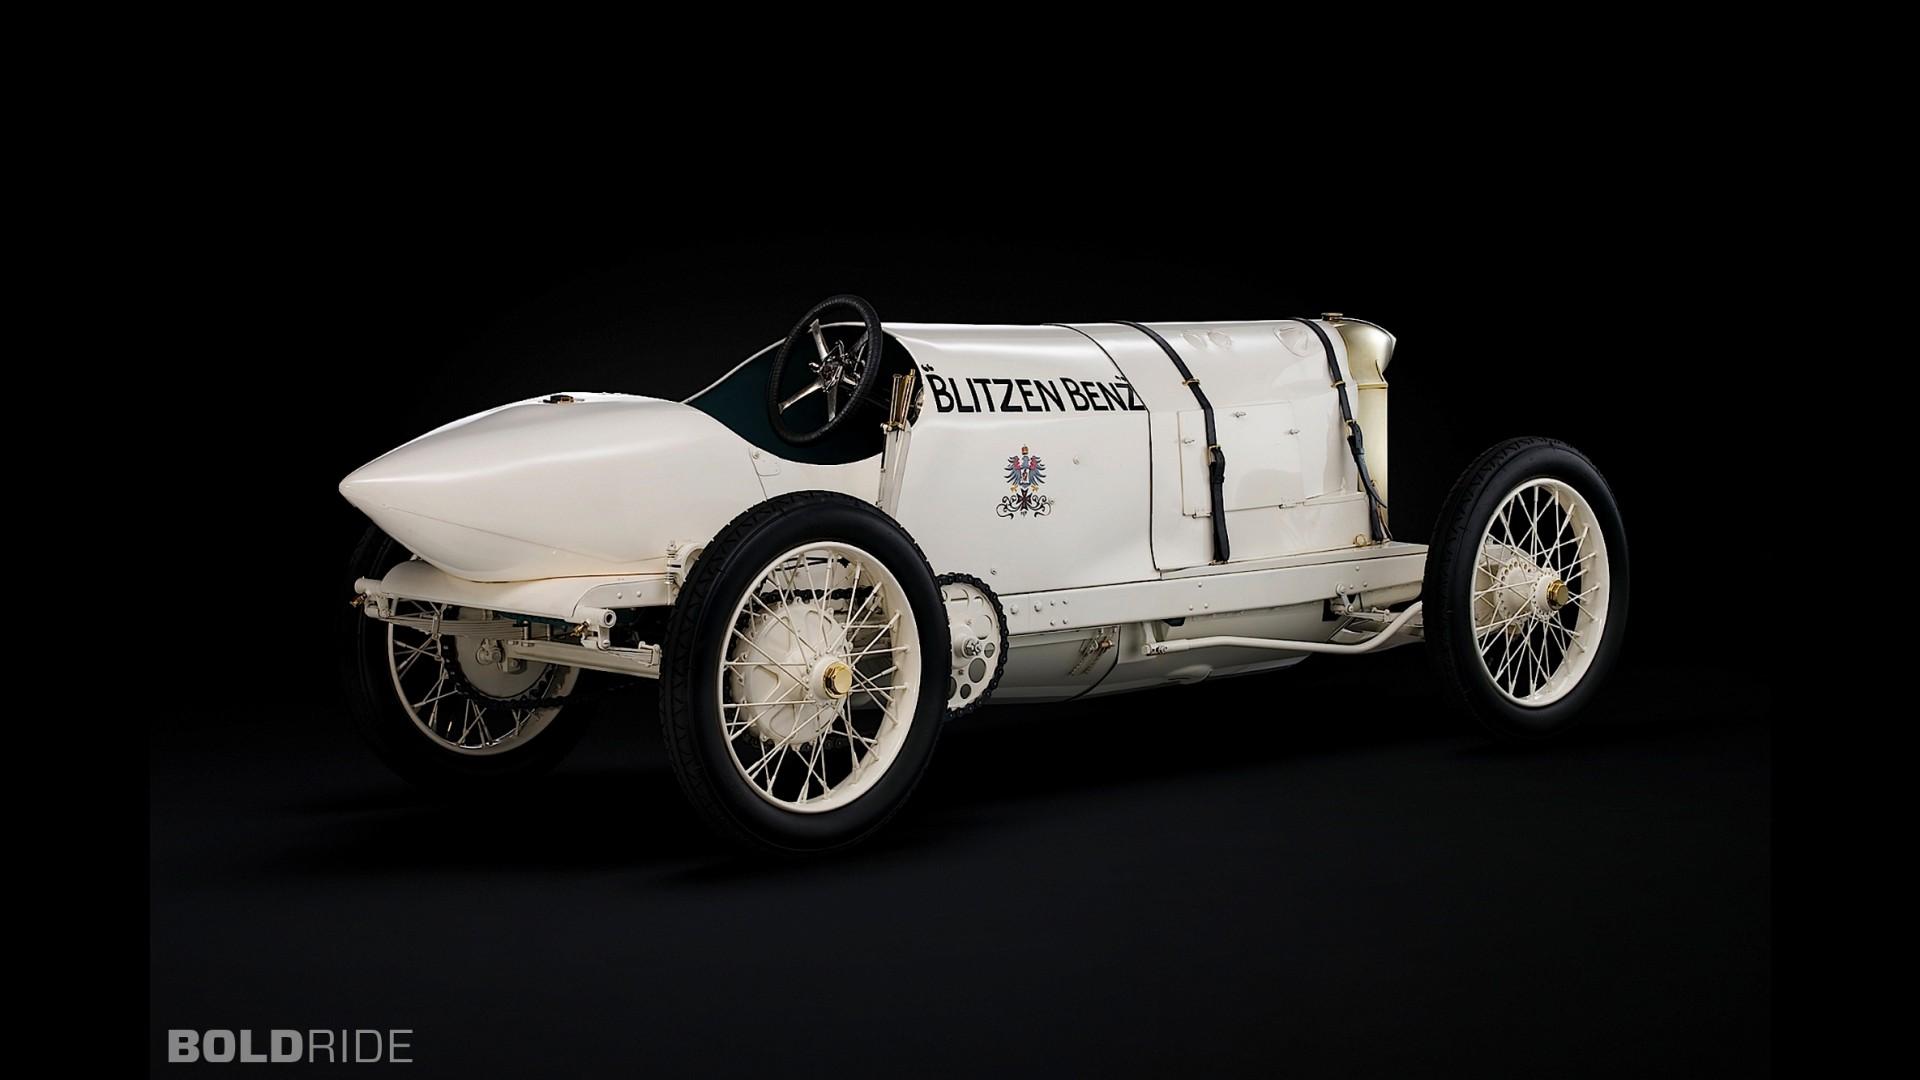 Mercedes-Benz Blitzen-Benz